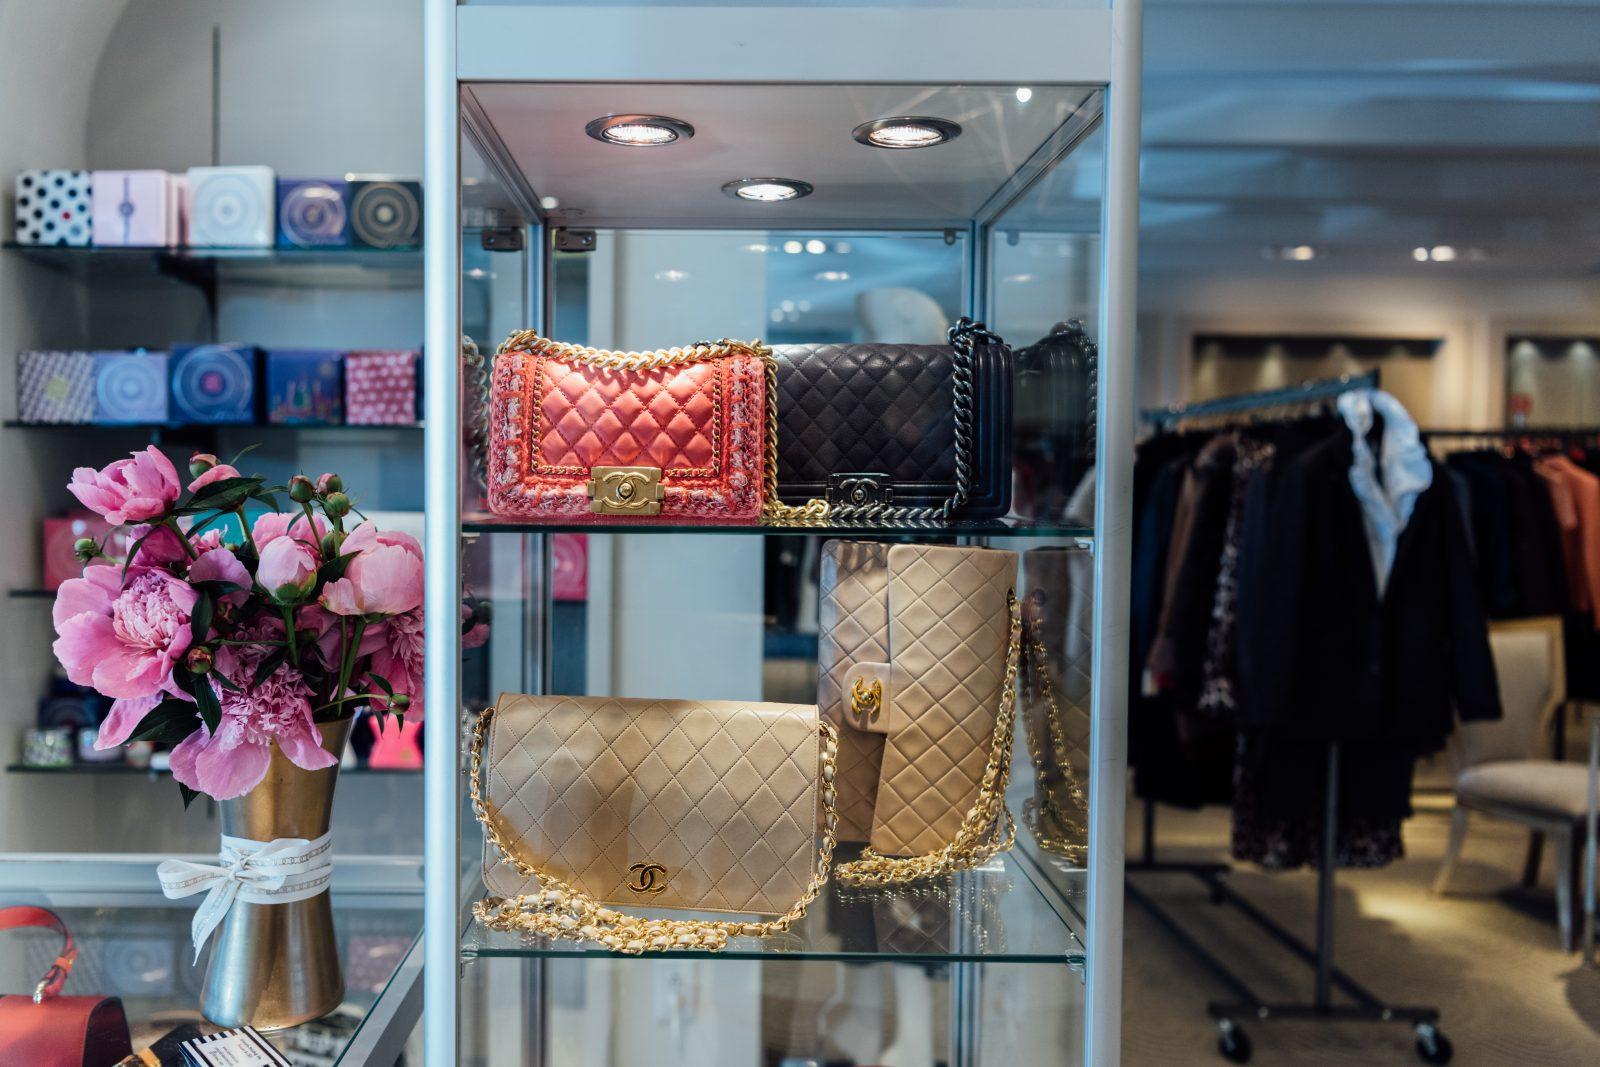 Fashion chanel bags at Gus Mayer